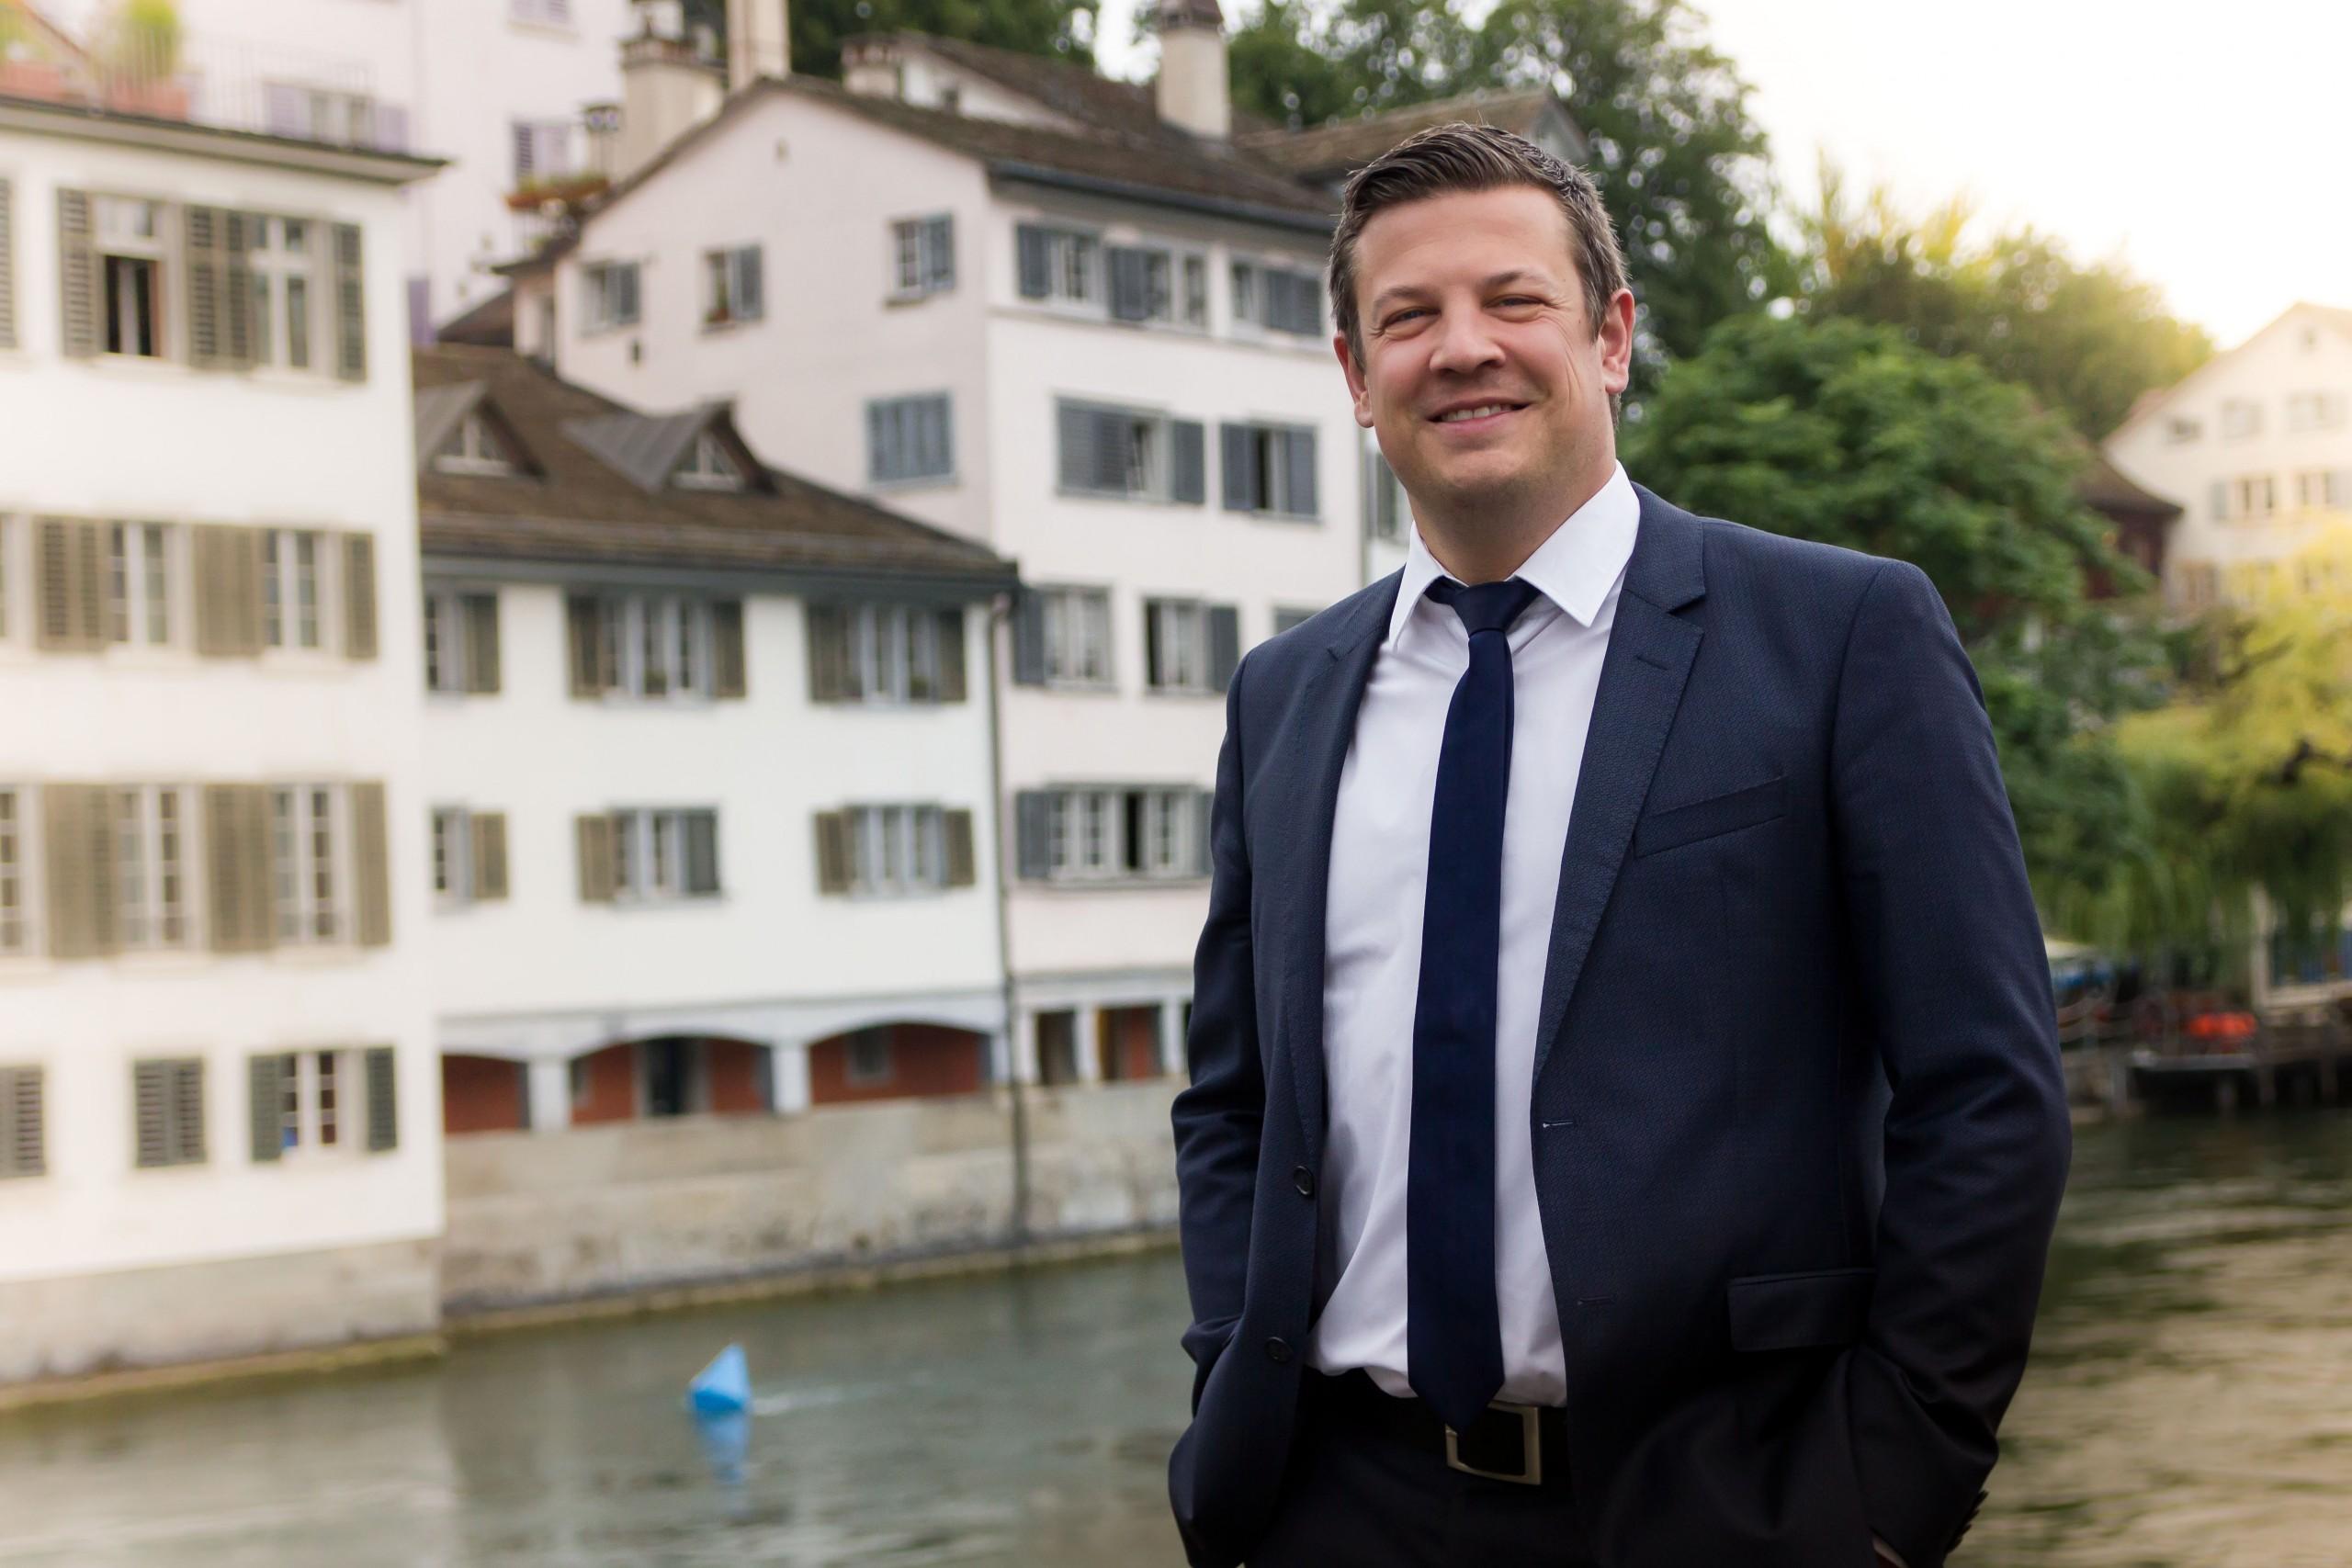 Thomas Steininger: Anwalt Arbeitsrecht, Anwalt Gesellschaftsrecht, Anwalt Mietrecht, Anwalt Vertragsrecht, Anwalt Familienrecht, Anwalt Migrationsrecht